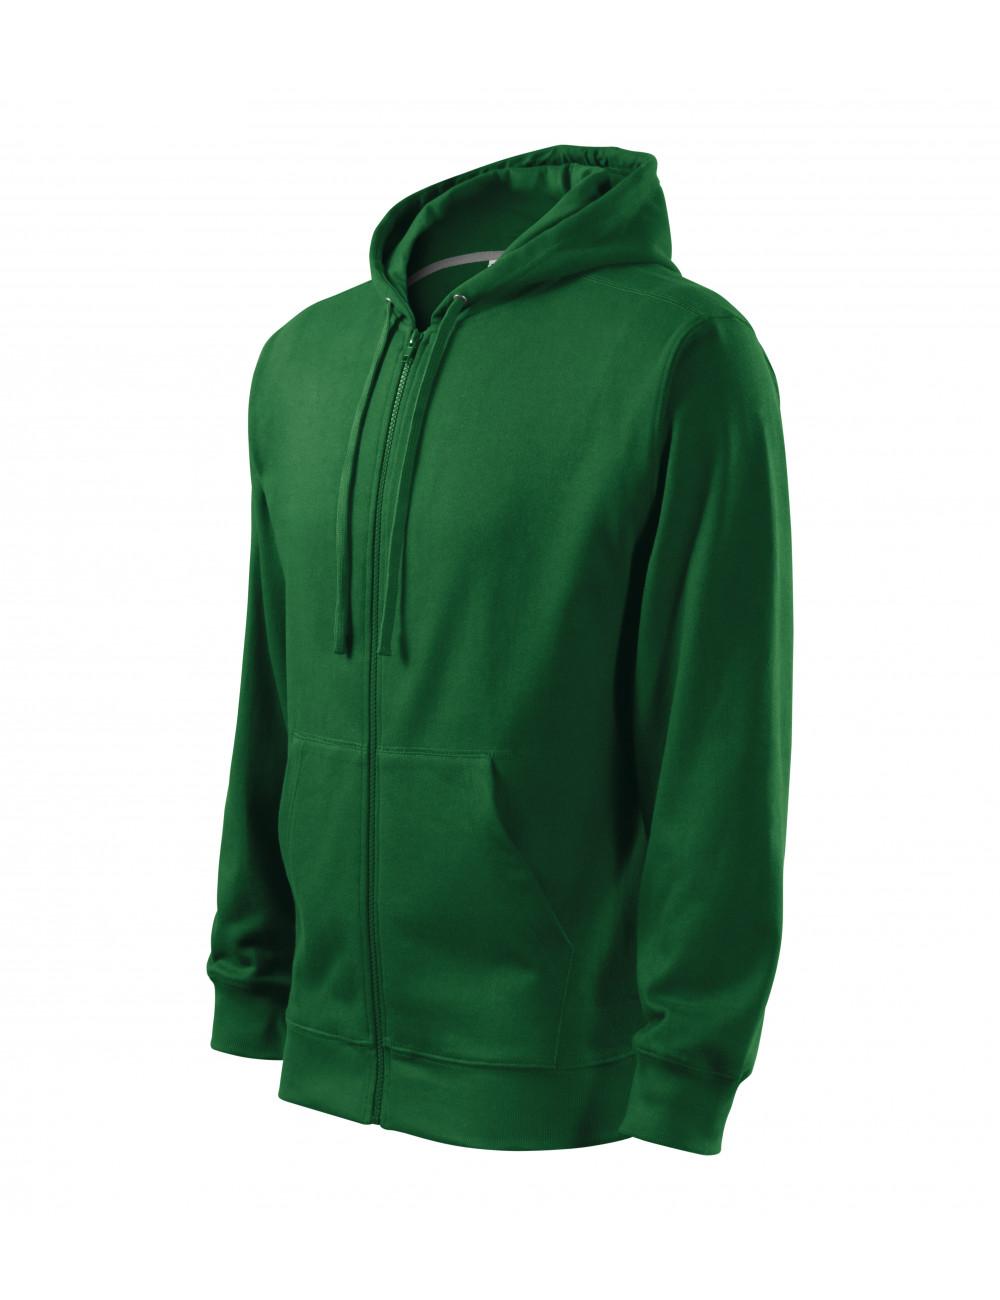 Adler MALFINI Bluza męska Trendy Zipper 410 zieleń butelkowa